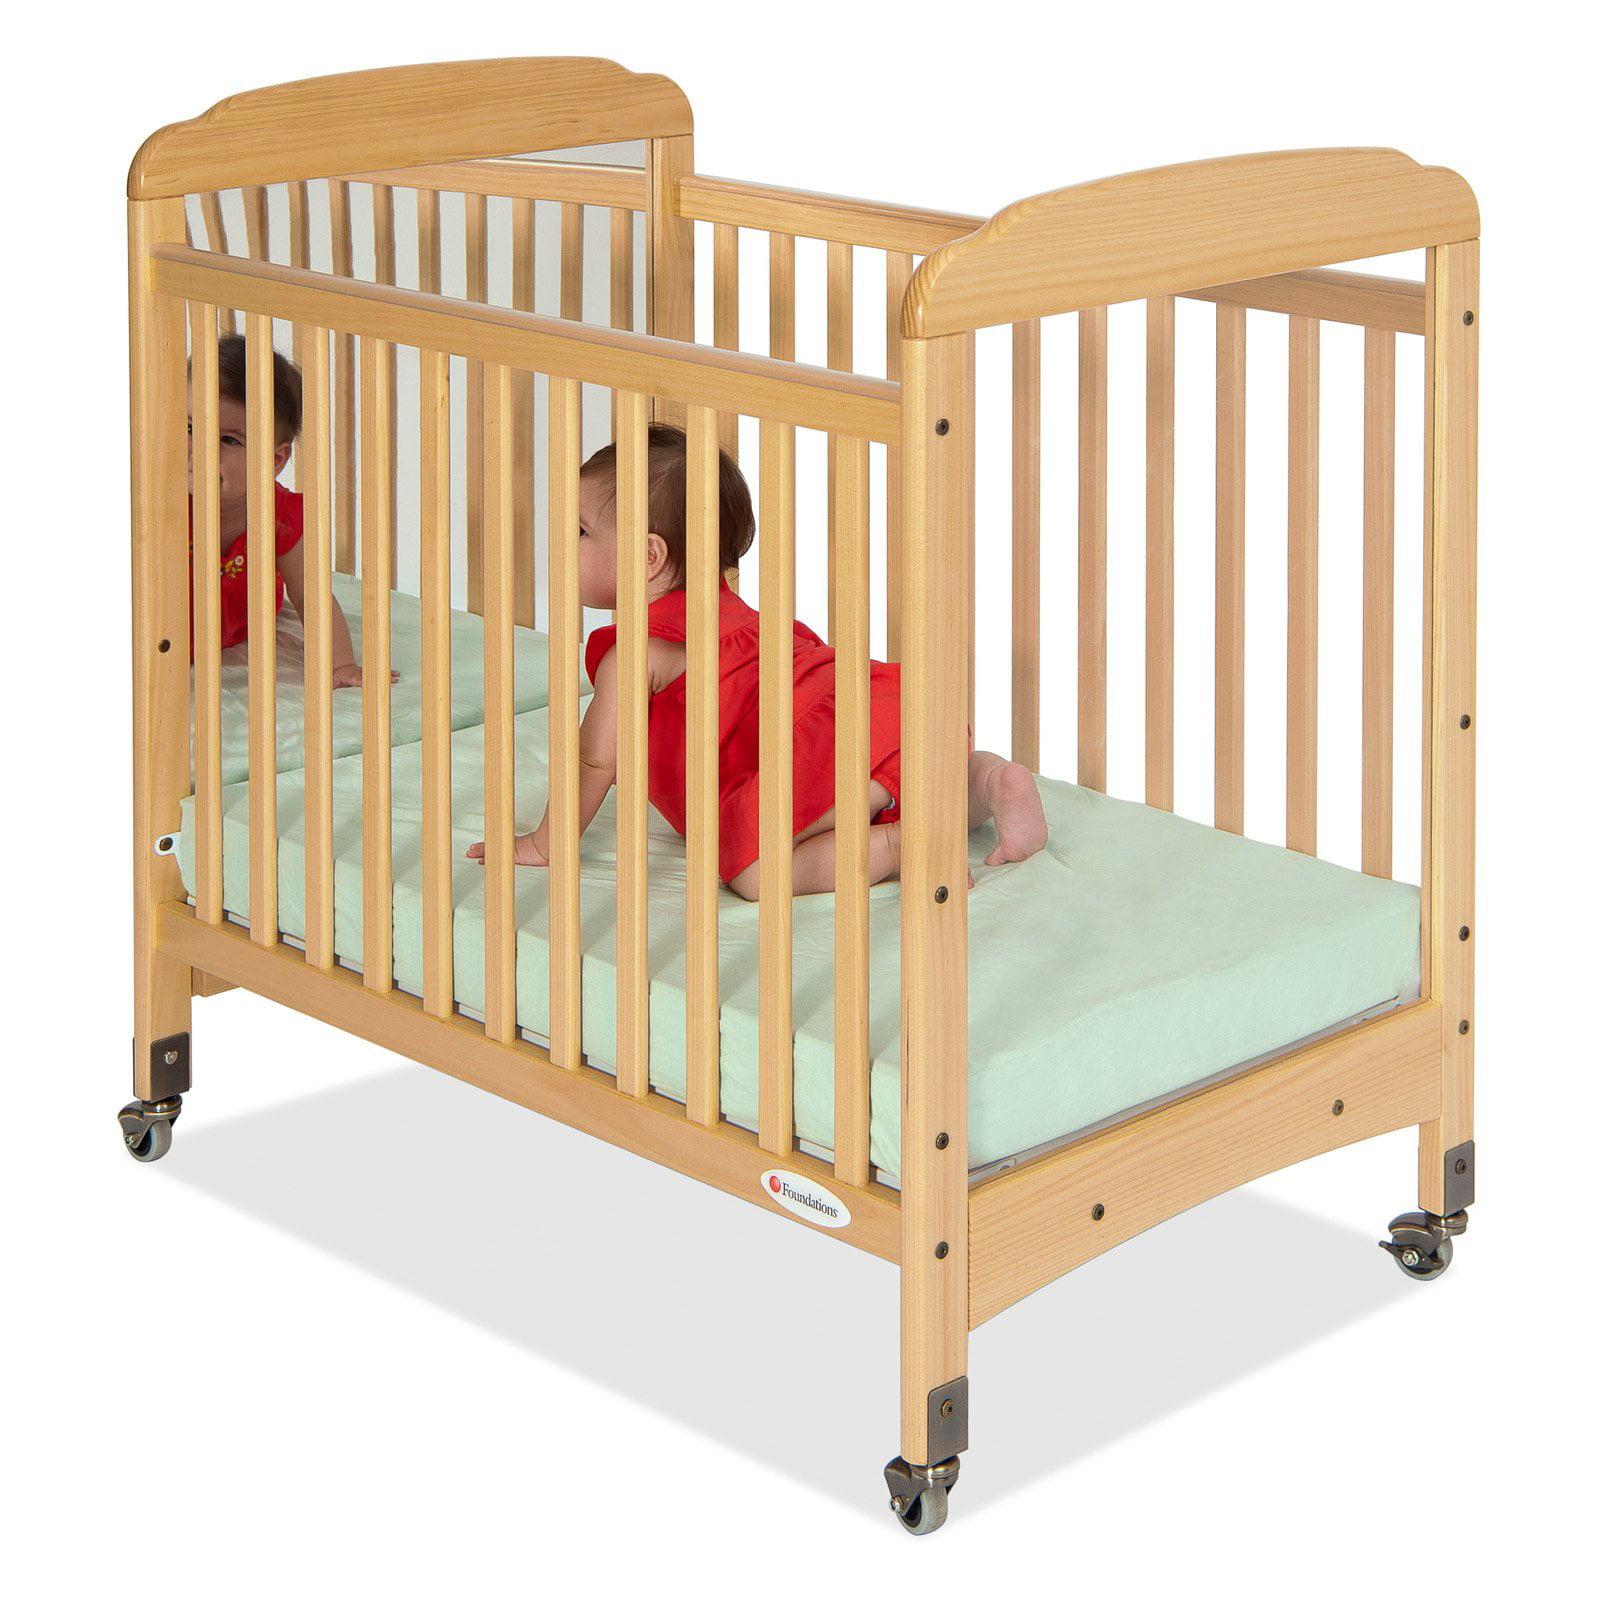 Foundations Serenity Mirror End Compact Crib - Natural